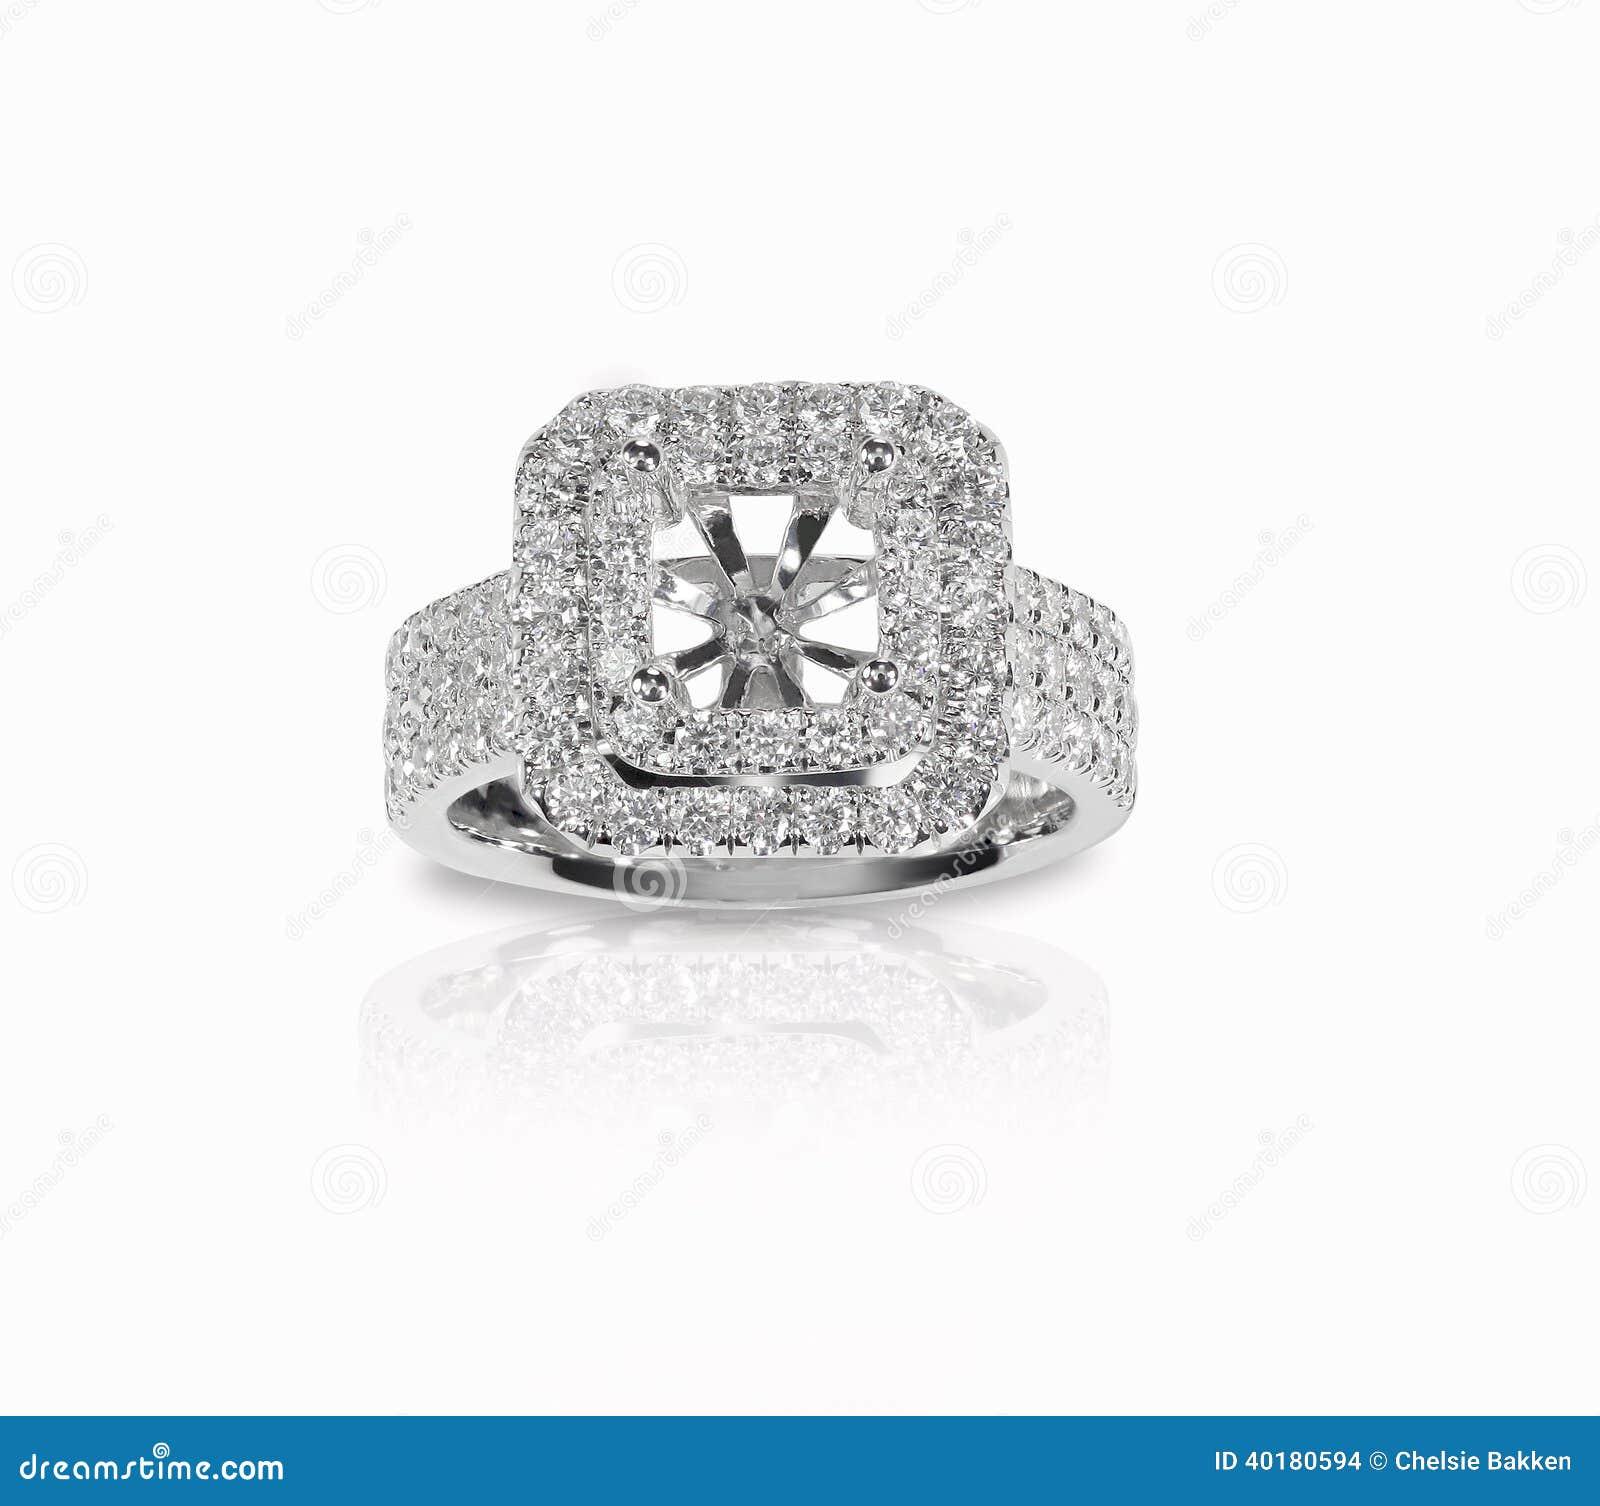 Halo DIamond Engagment Wedding Ring Setting